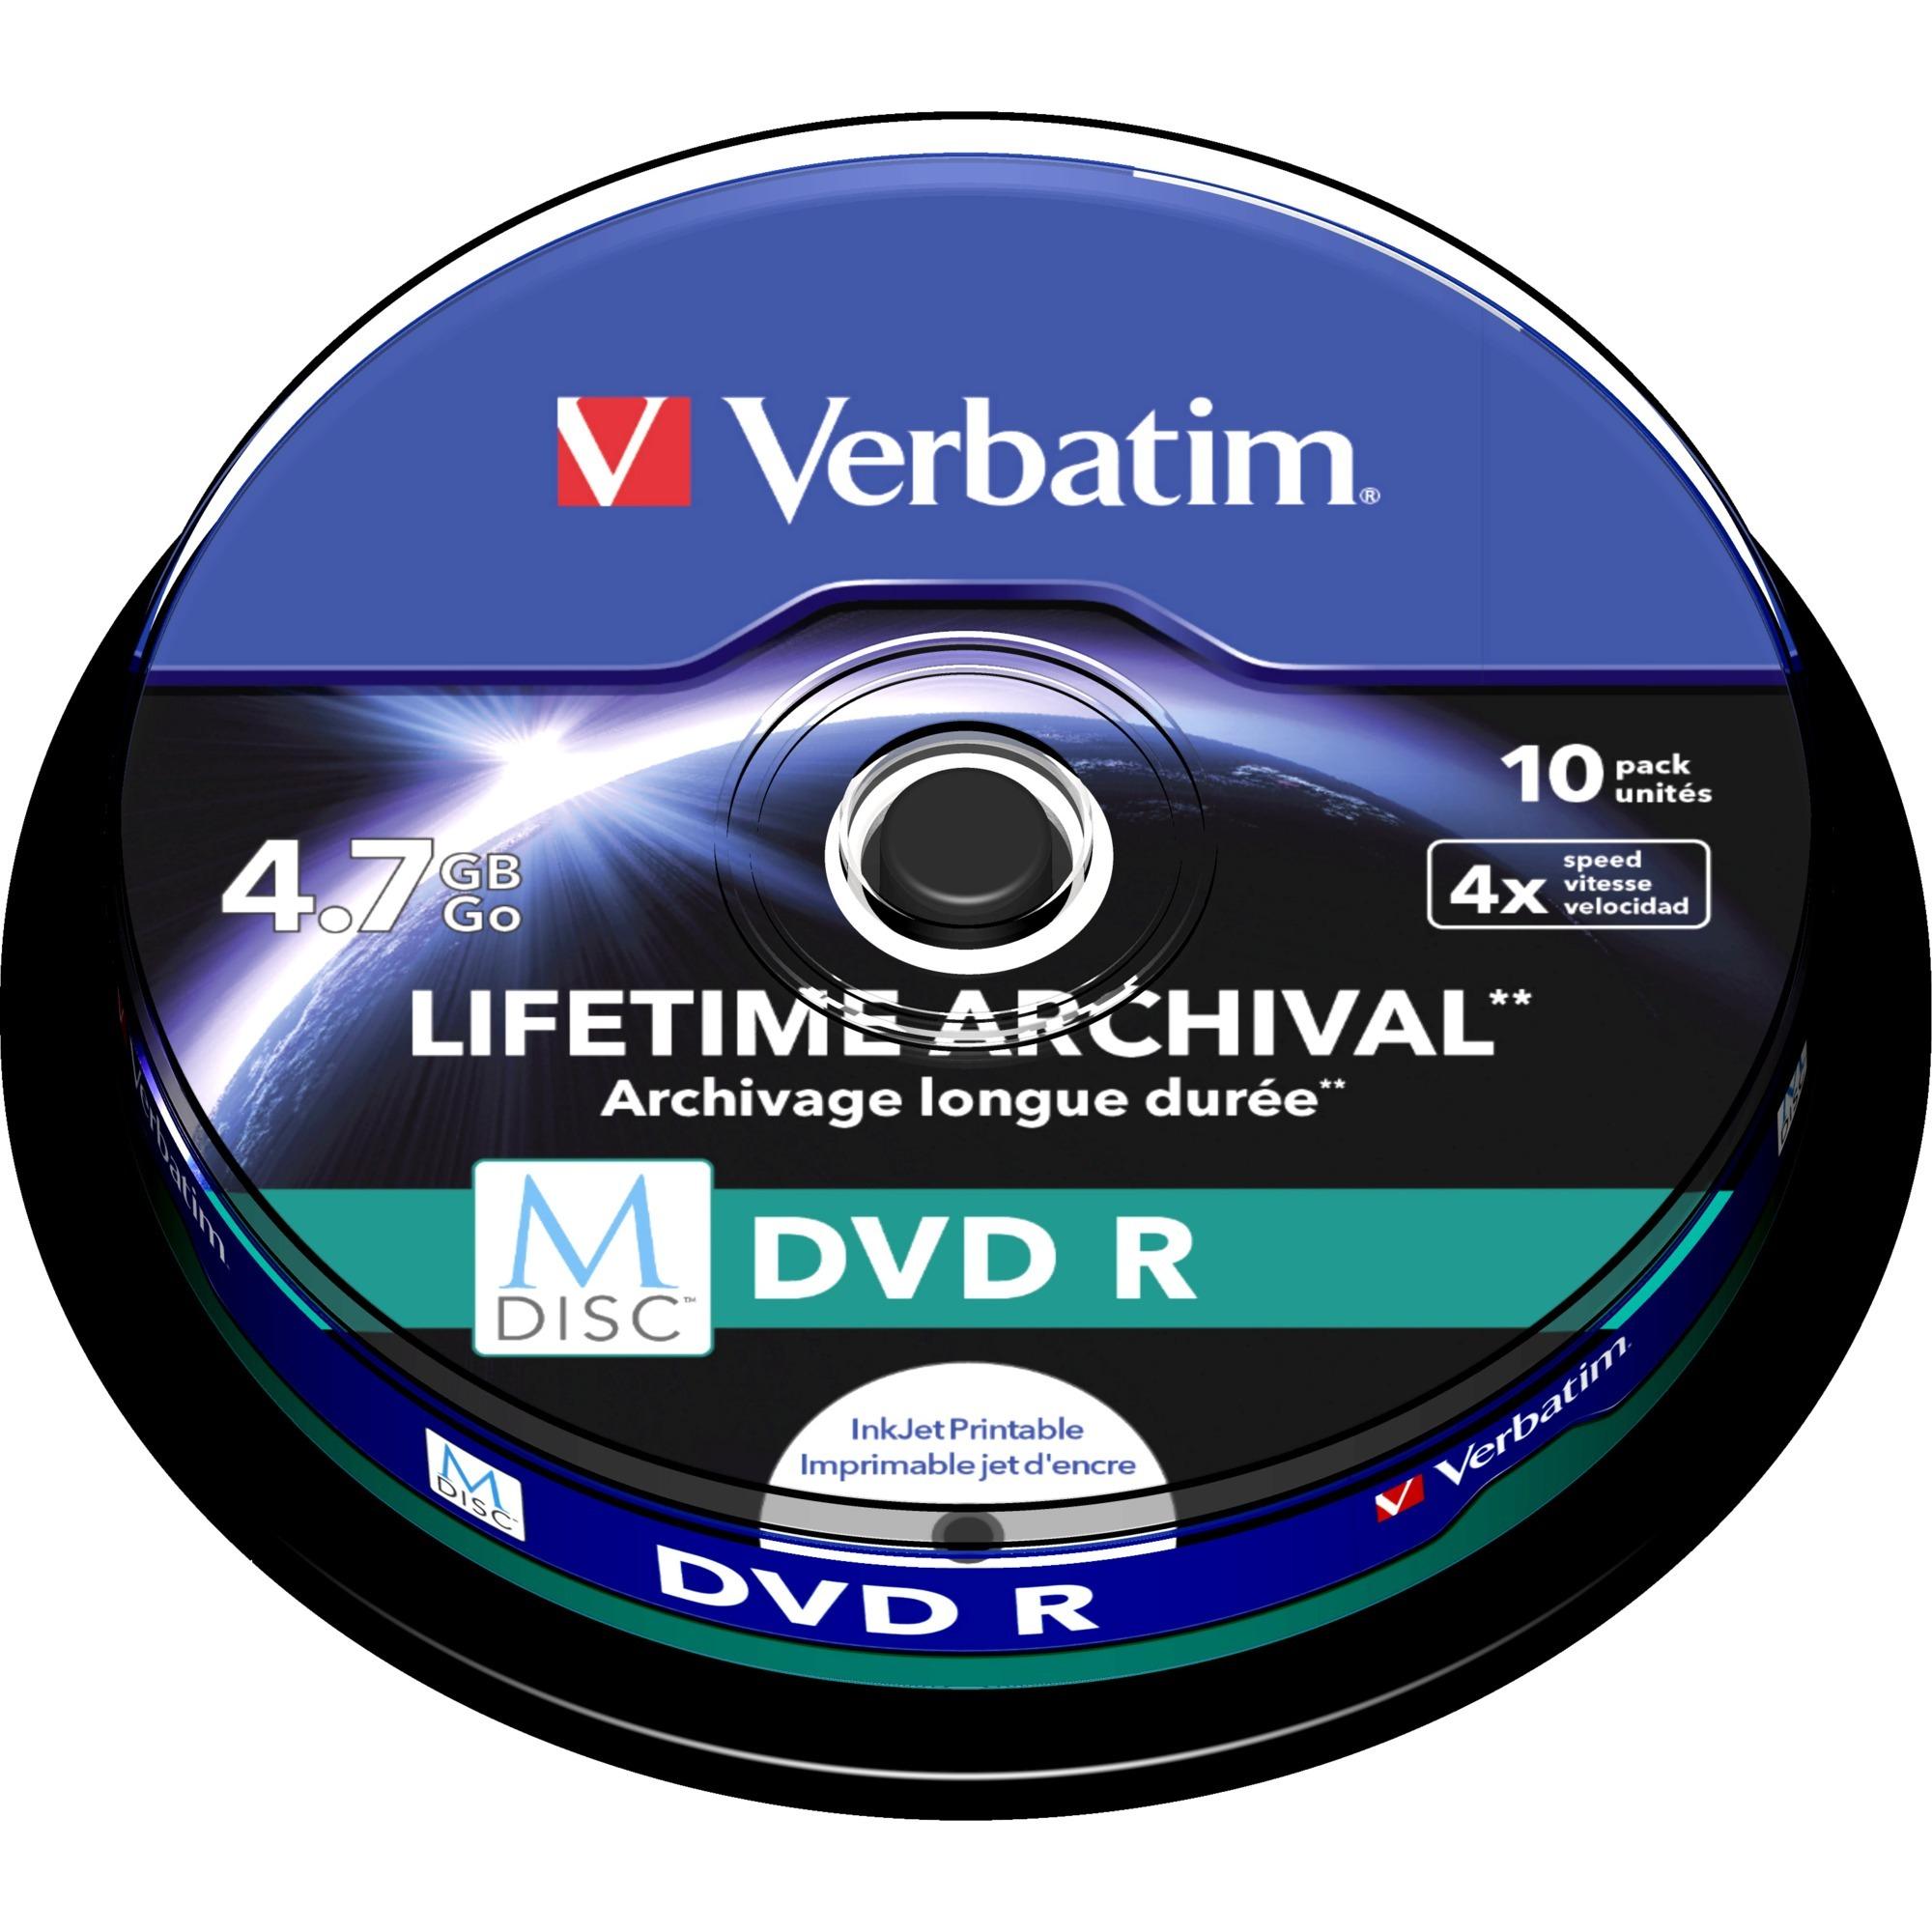 M-Disc (DVD-R) 4,7GB, Support vierge DVD